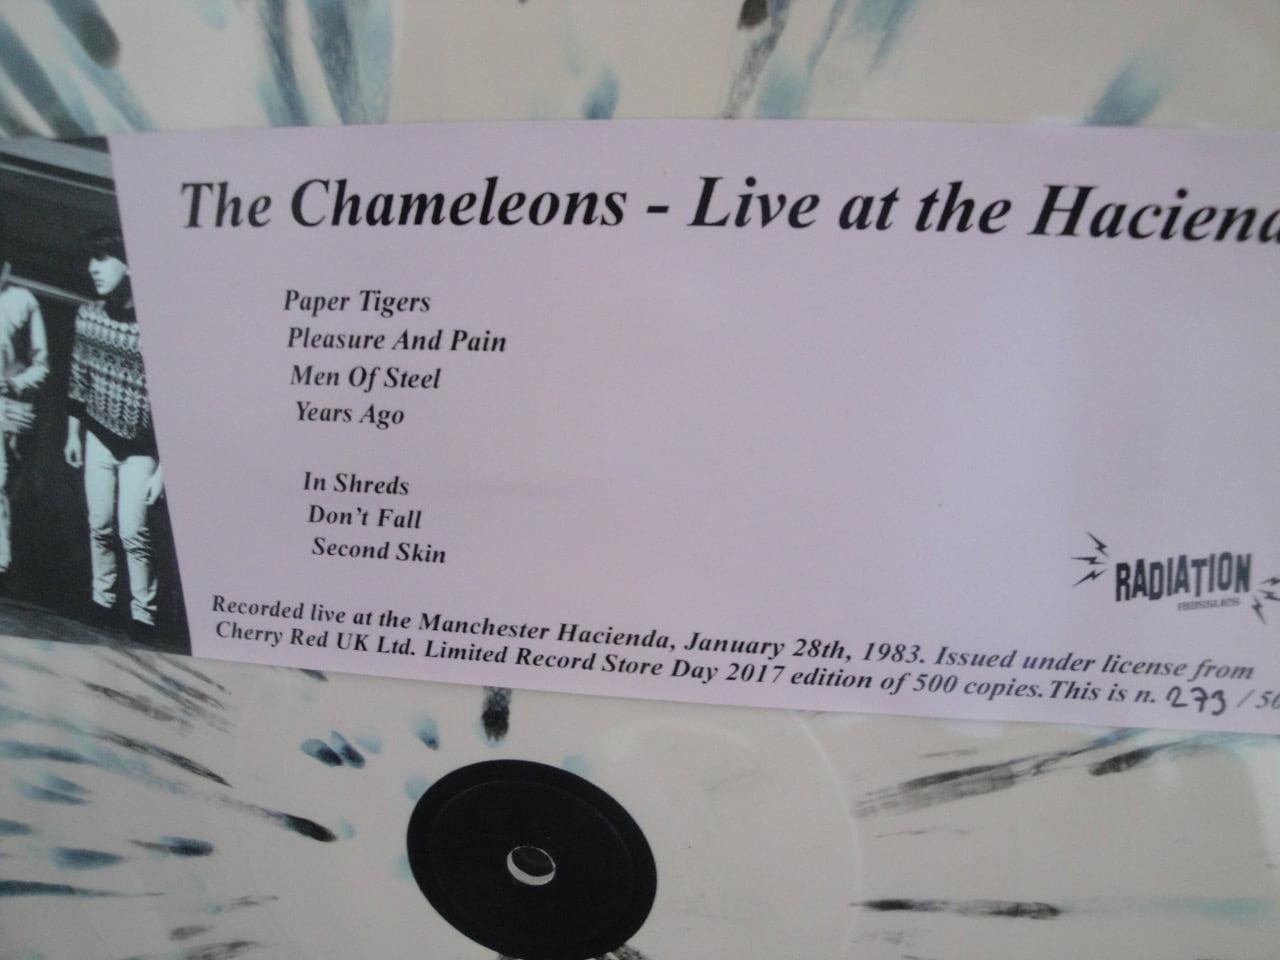 The Chameleons - Live At The Hacienda - Ltd Ed of 500, Radiation, Reissue